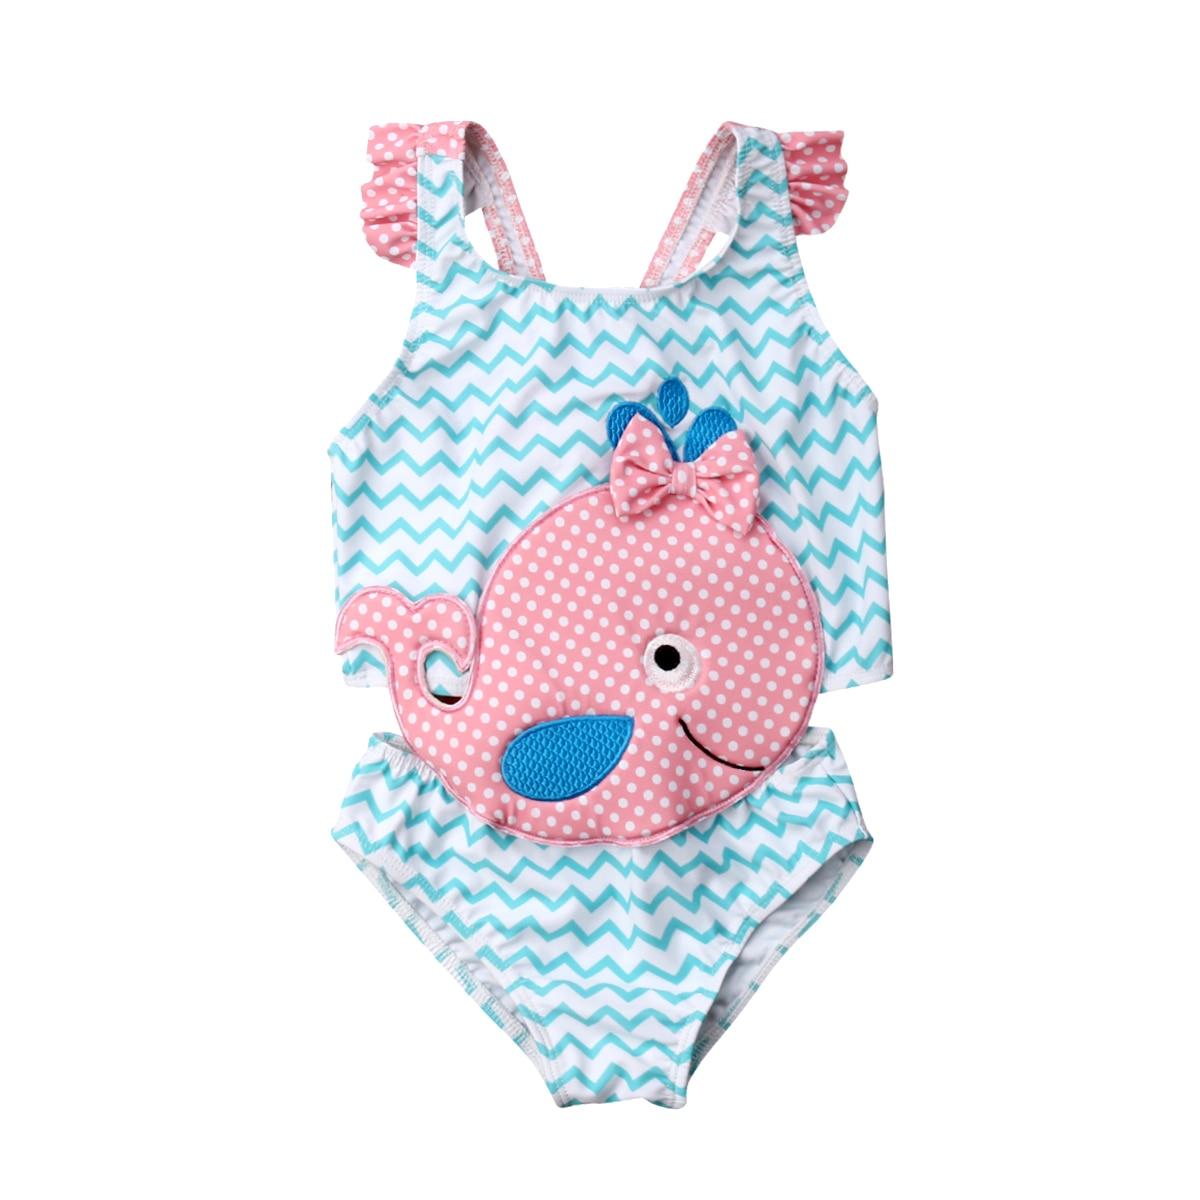 Pudcoco 2019 Summer Baby Girls Goldfish Swimwear Swimsuit Beachwear Bathing Suit One Piece